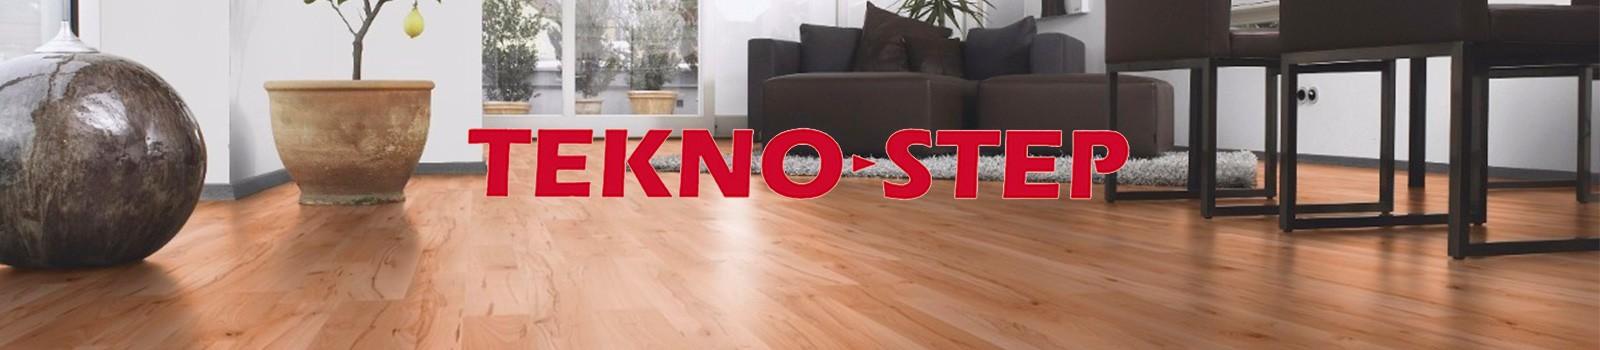 pisos laminados tekno step